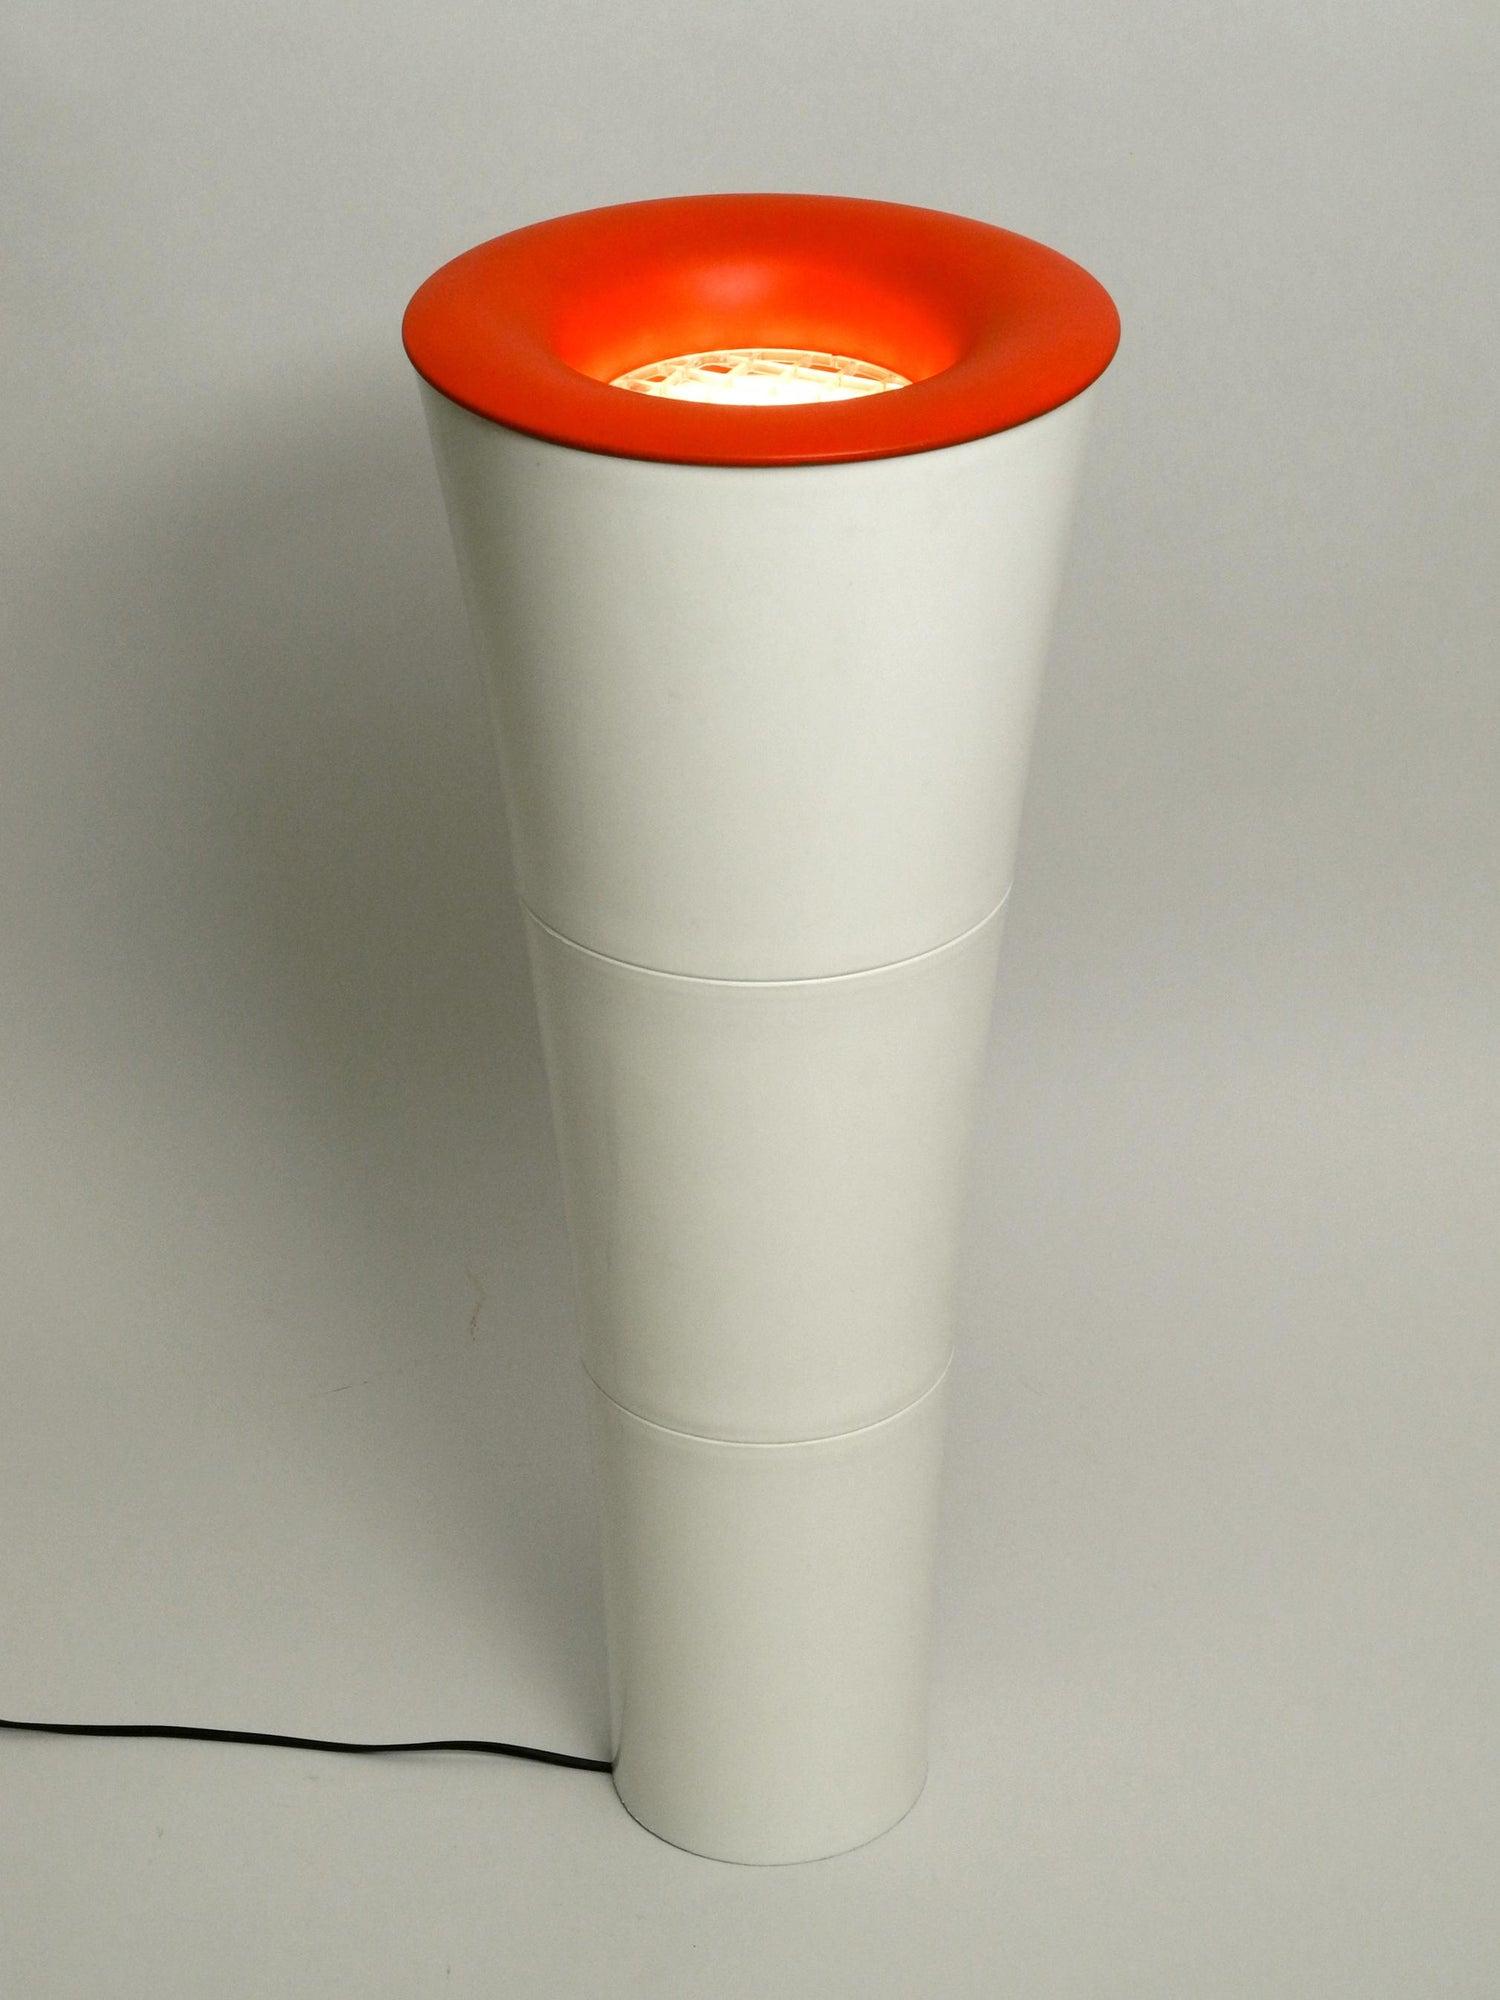 Rare Large 1980s Ikea Fackla Floor Lamp Uplighter Postmodern